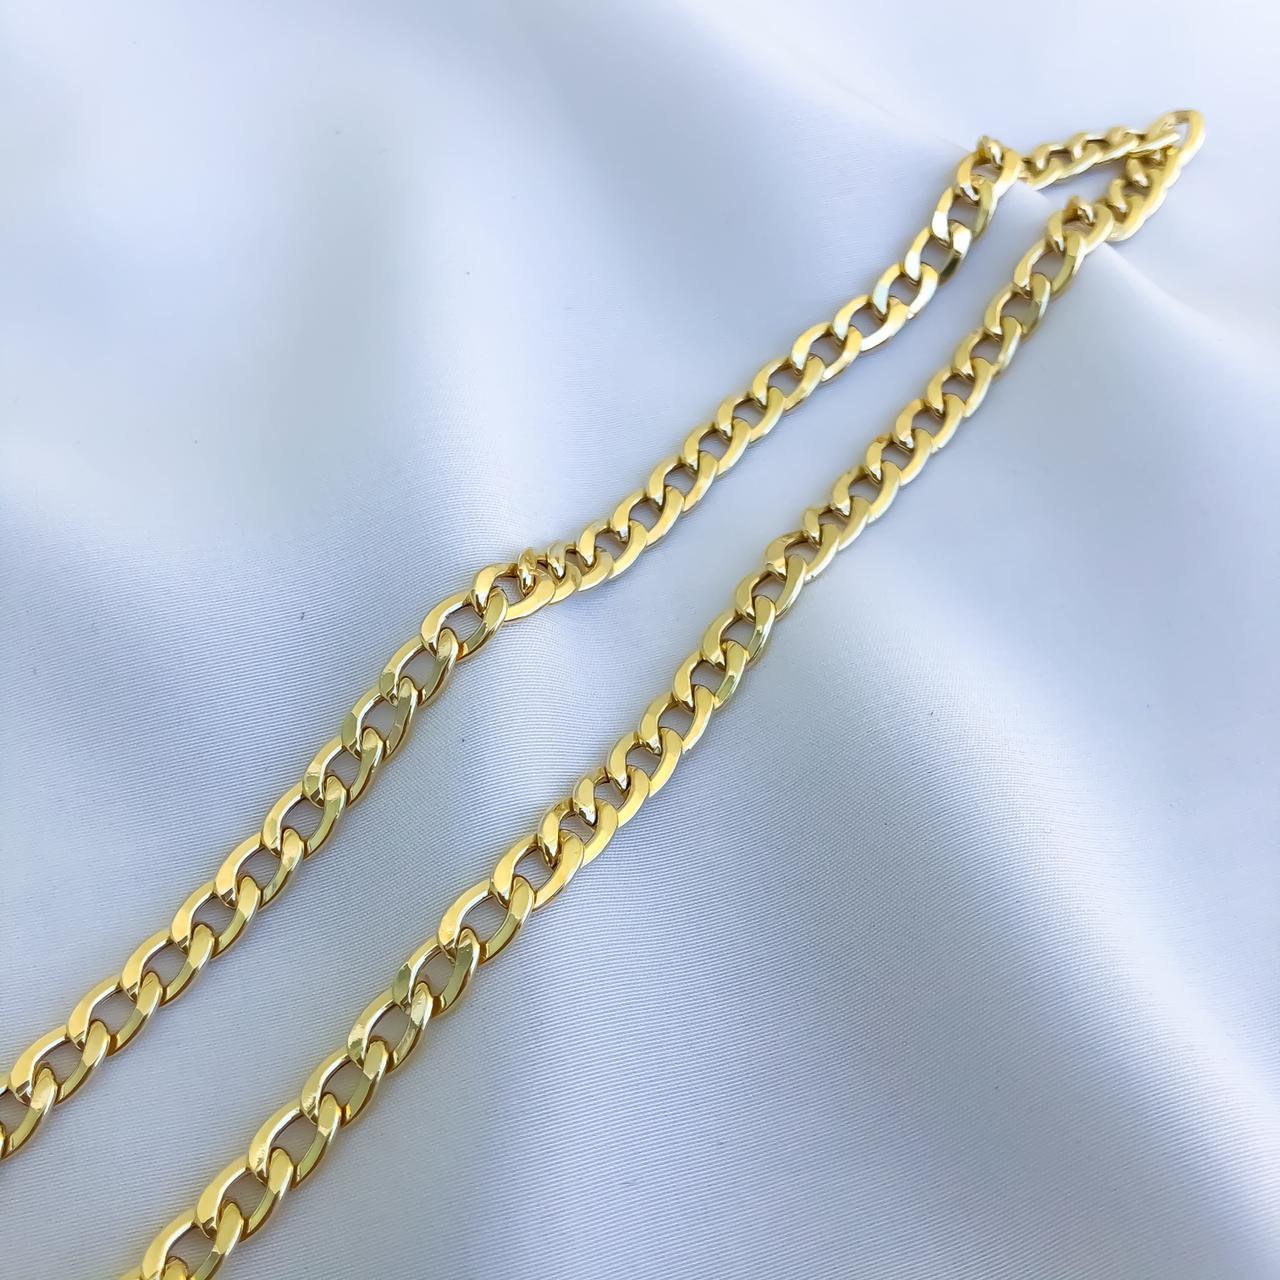 Corrente Groumet Médio em Ouro 18K 60cm